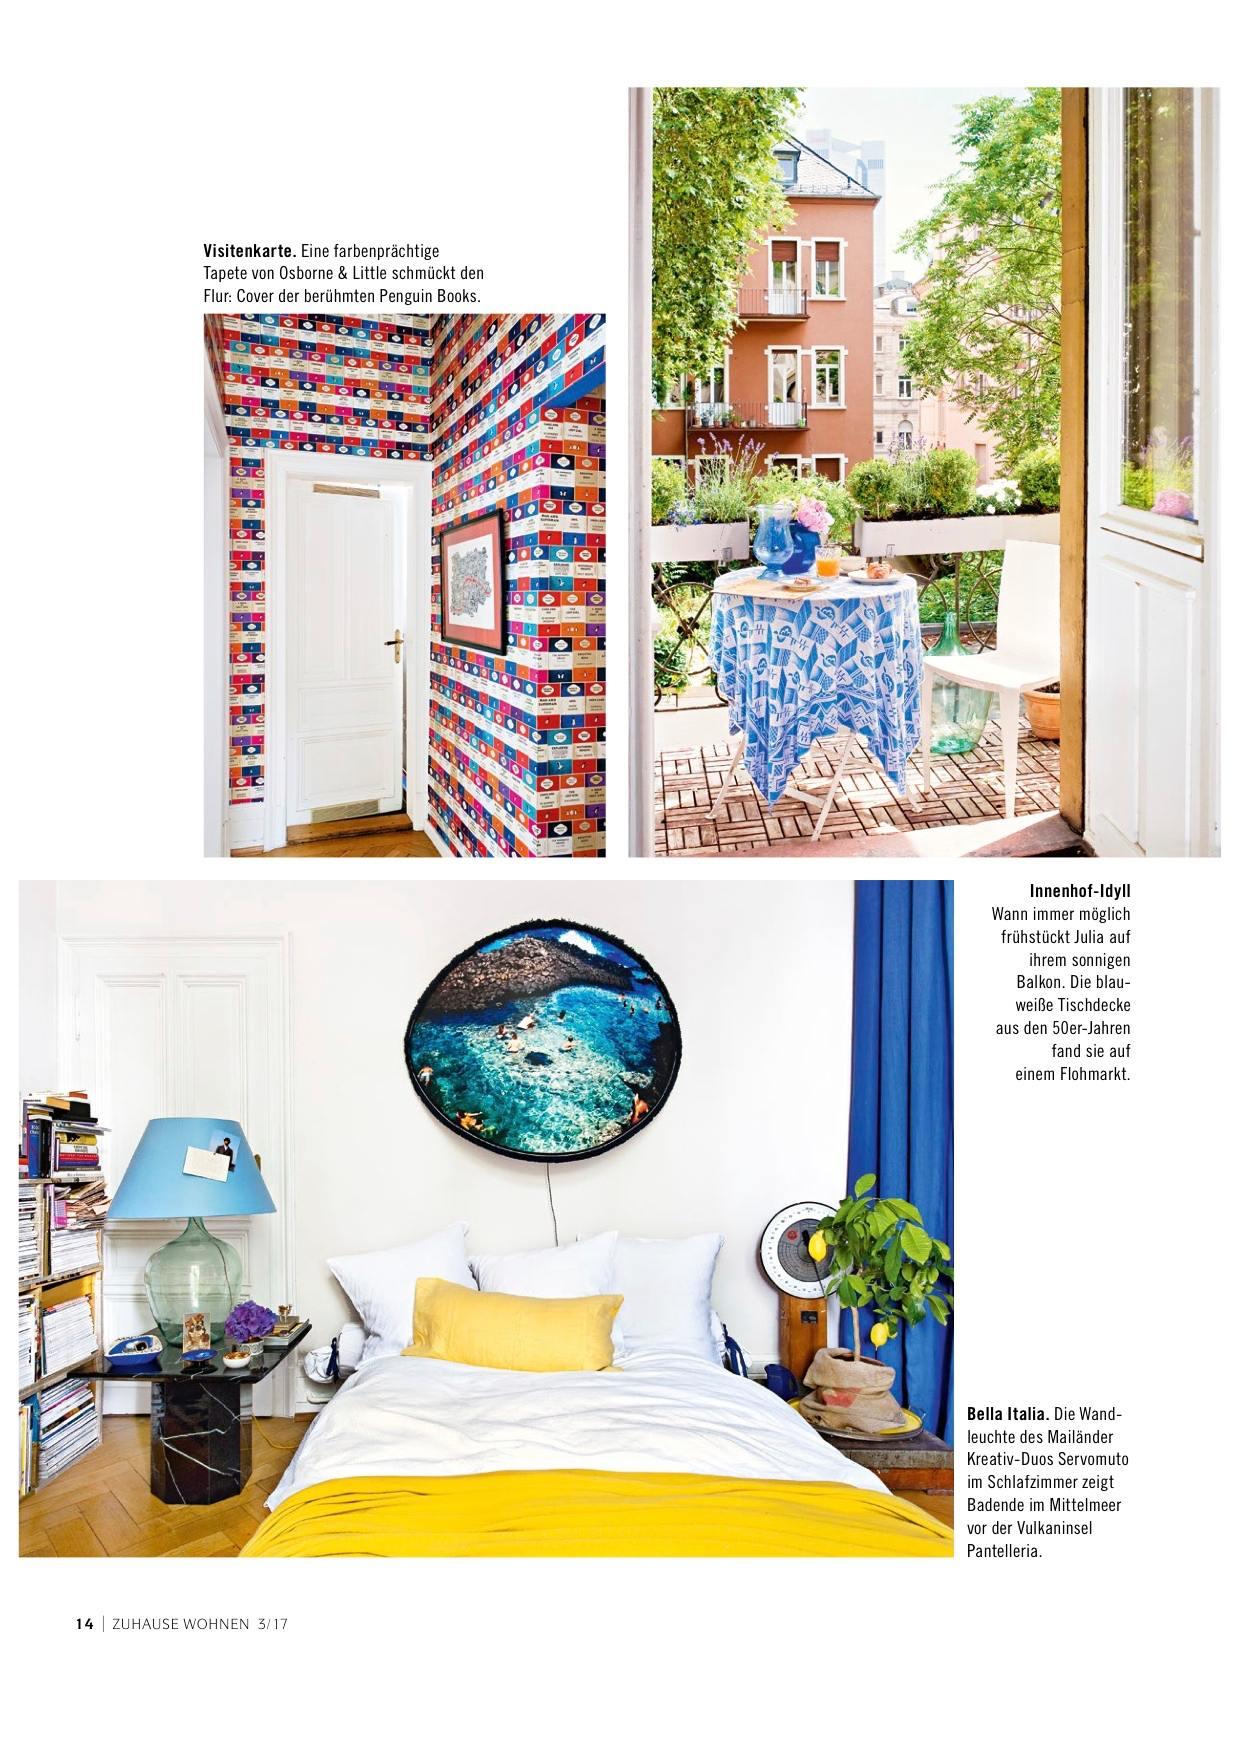 Julia Aulenbacher - Interiors +++ zu Hause wohnen 4